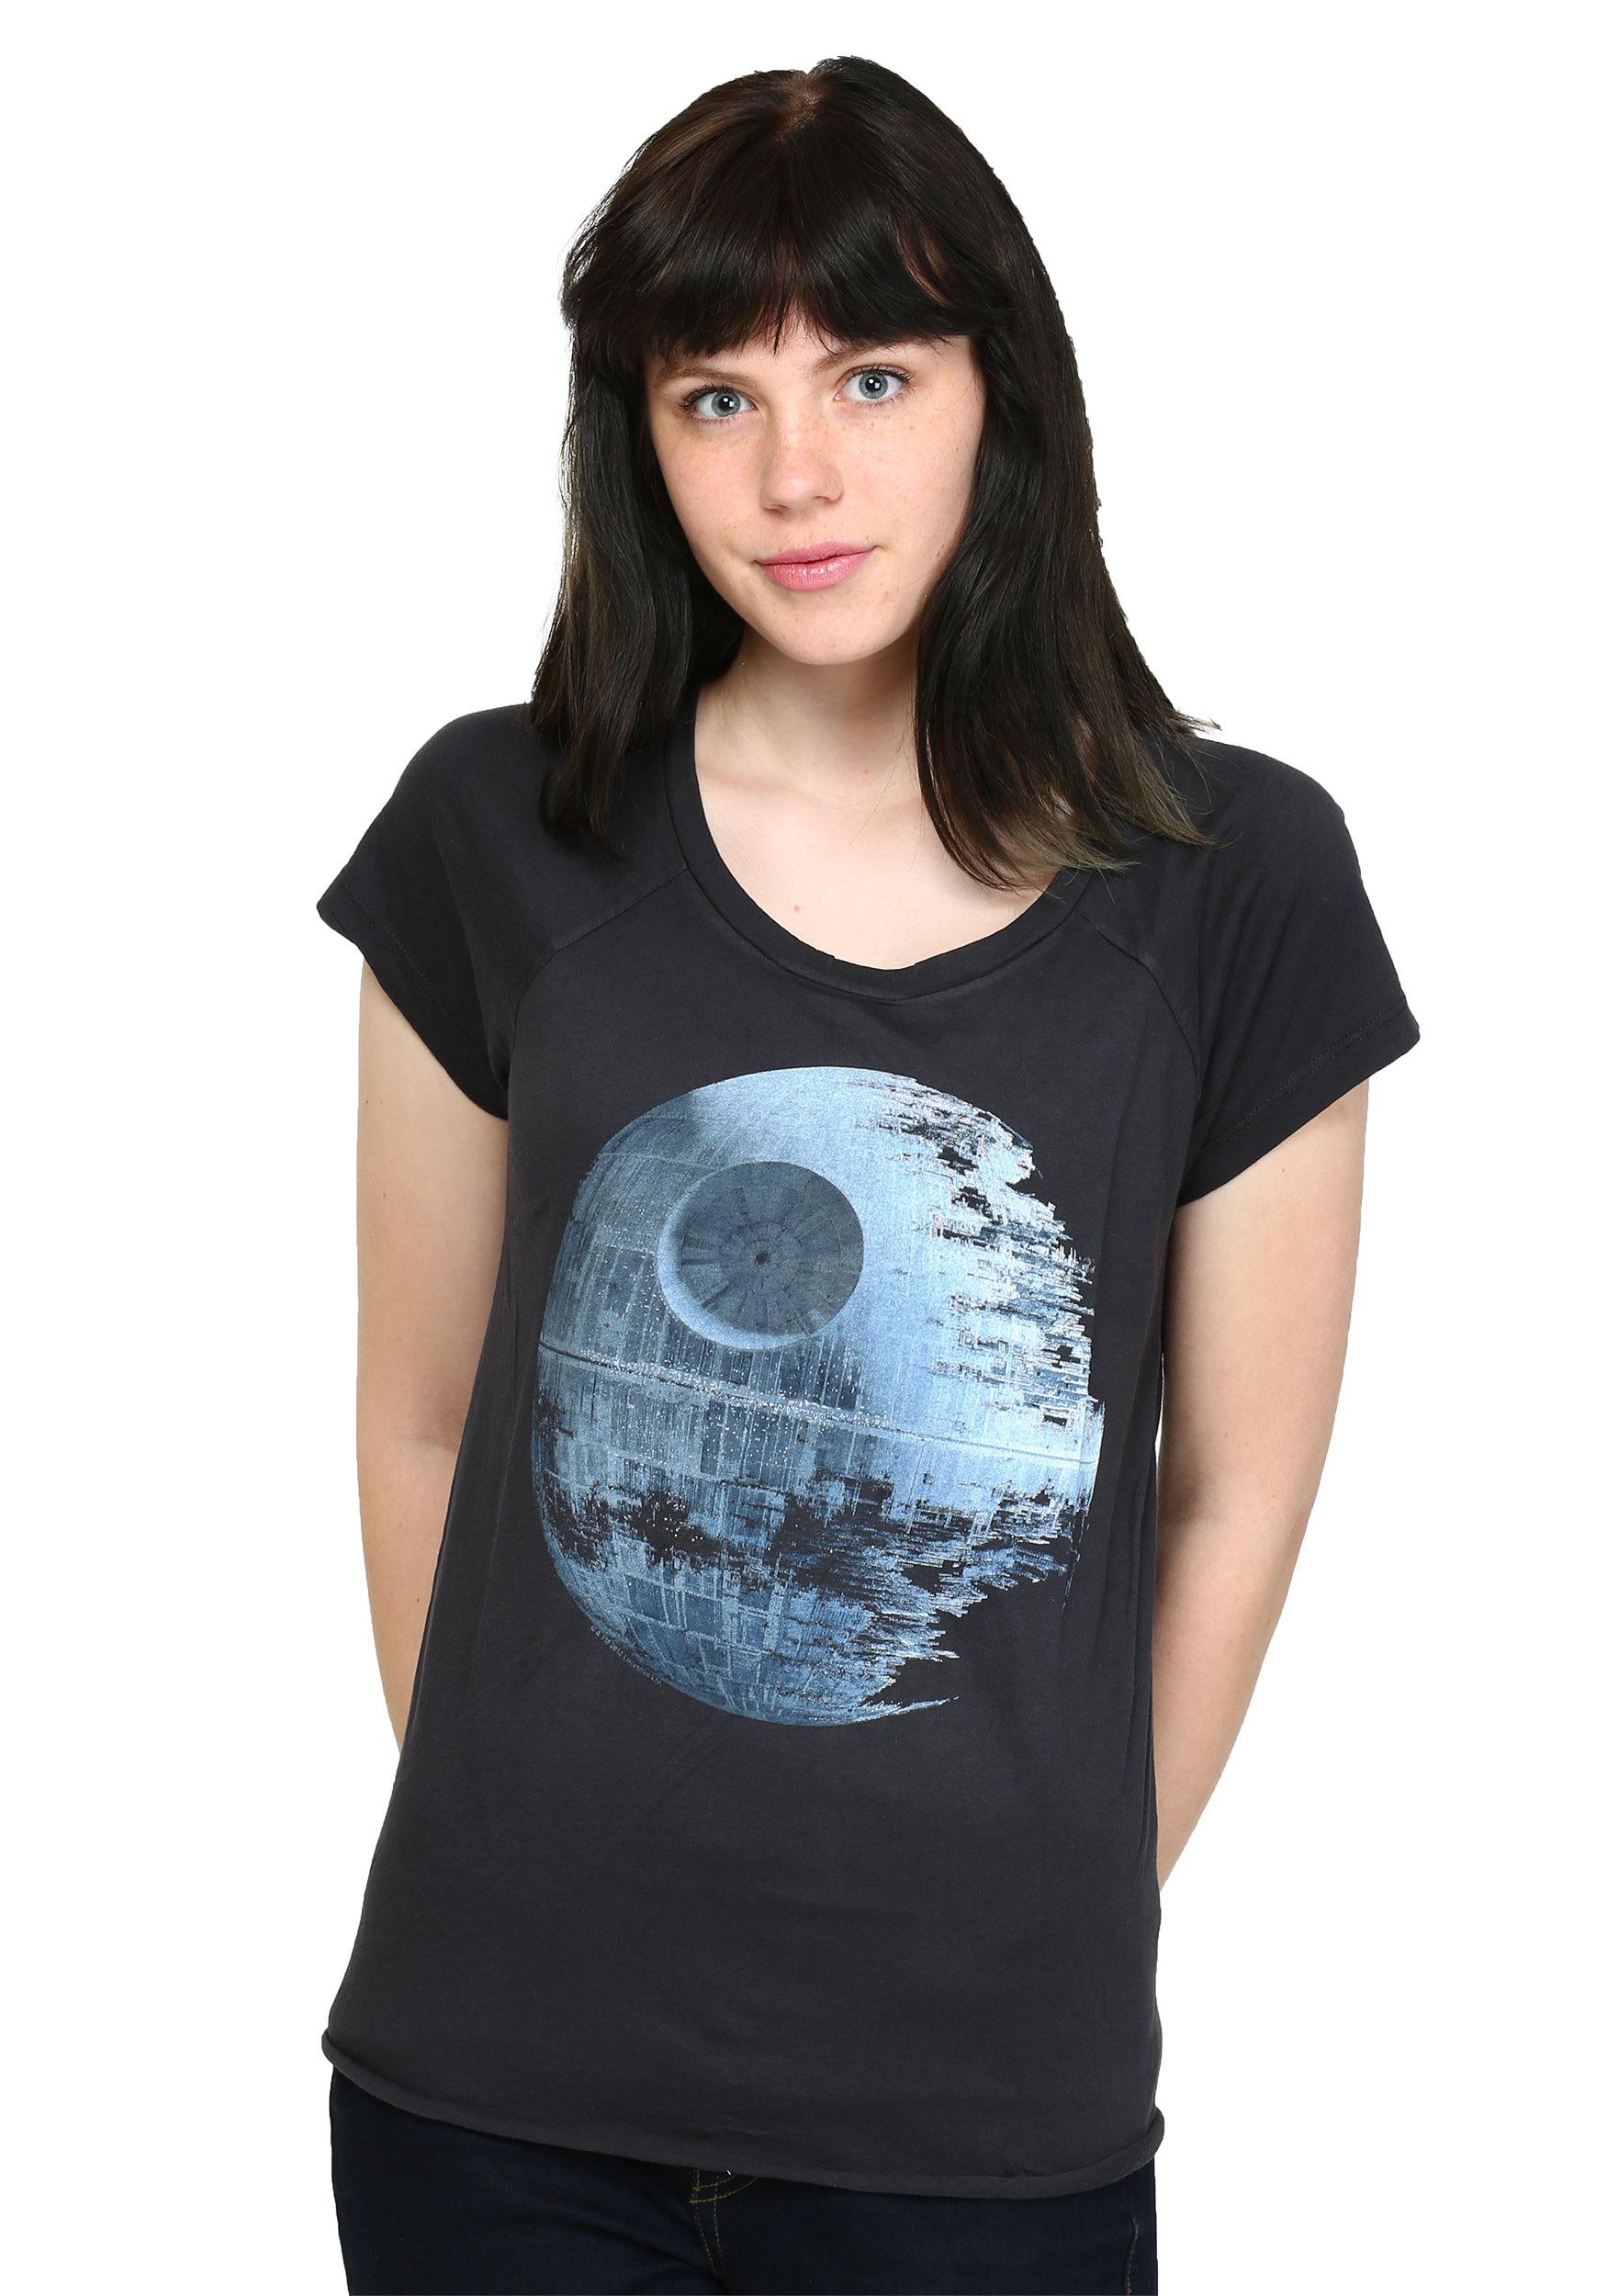 Star Wars Death Star Juniors T-Shirt e842a8ac0